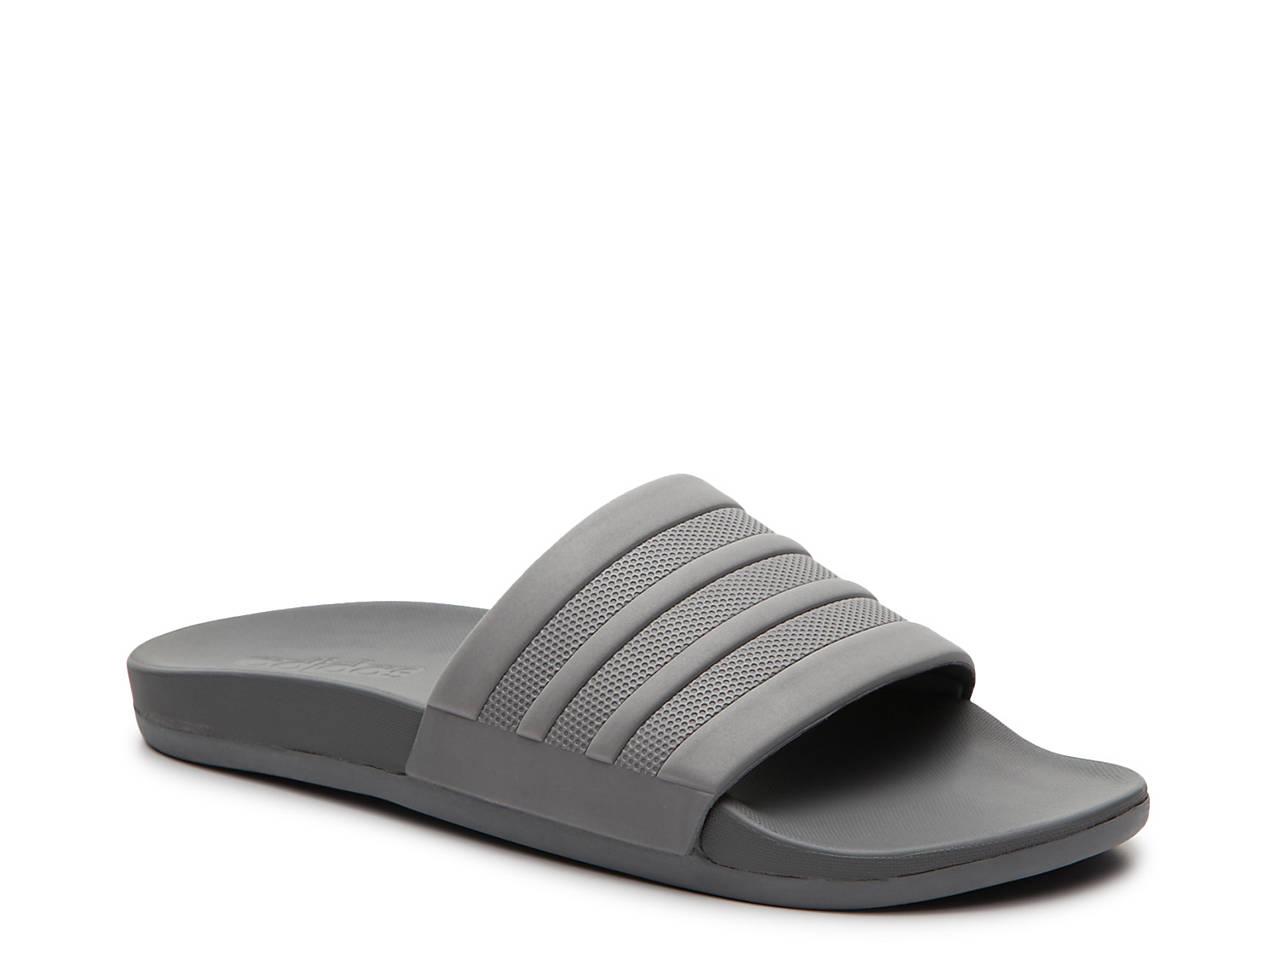 e03ffc319b44f Adilette Cloudfoam Mono Slide Sandal - Men's